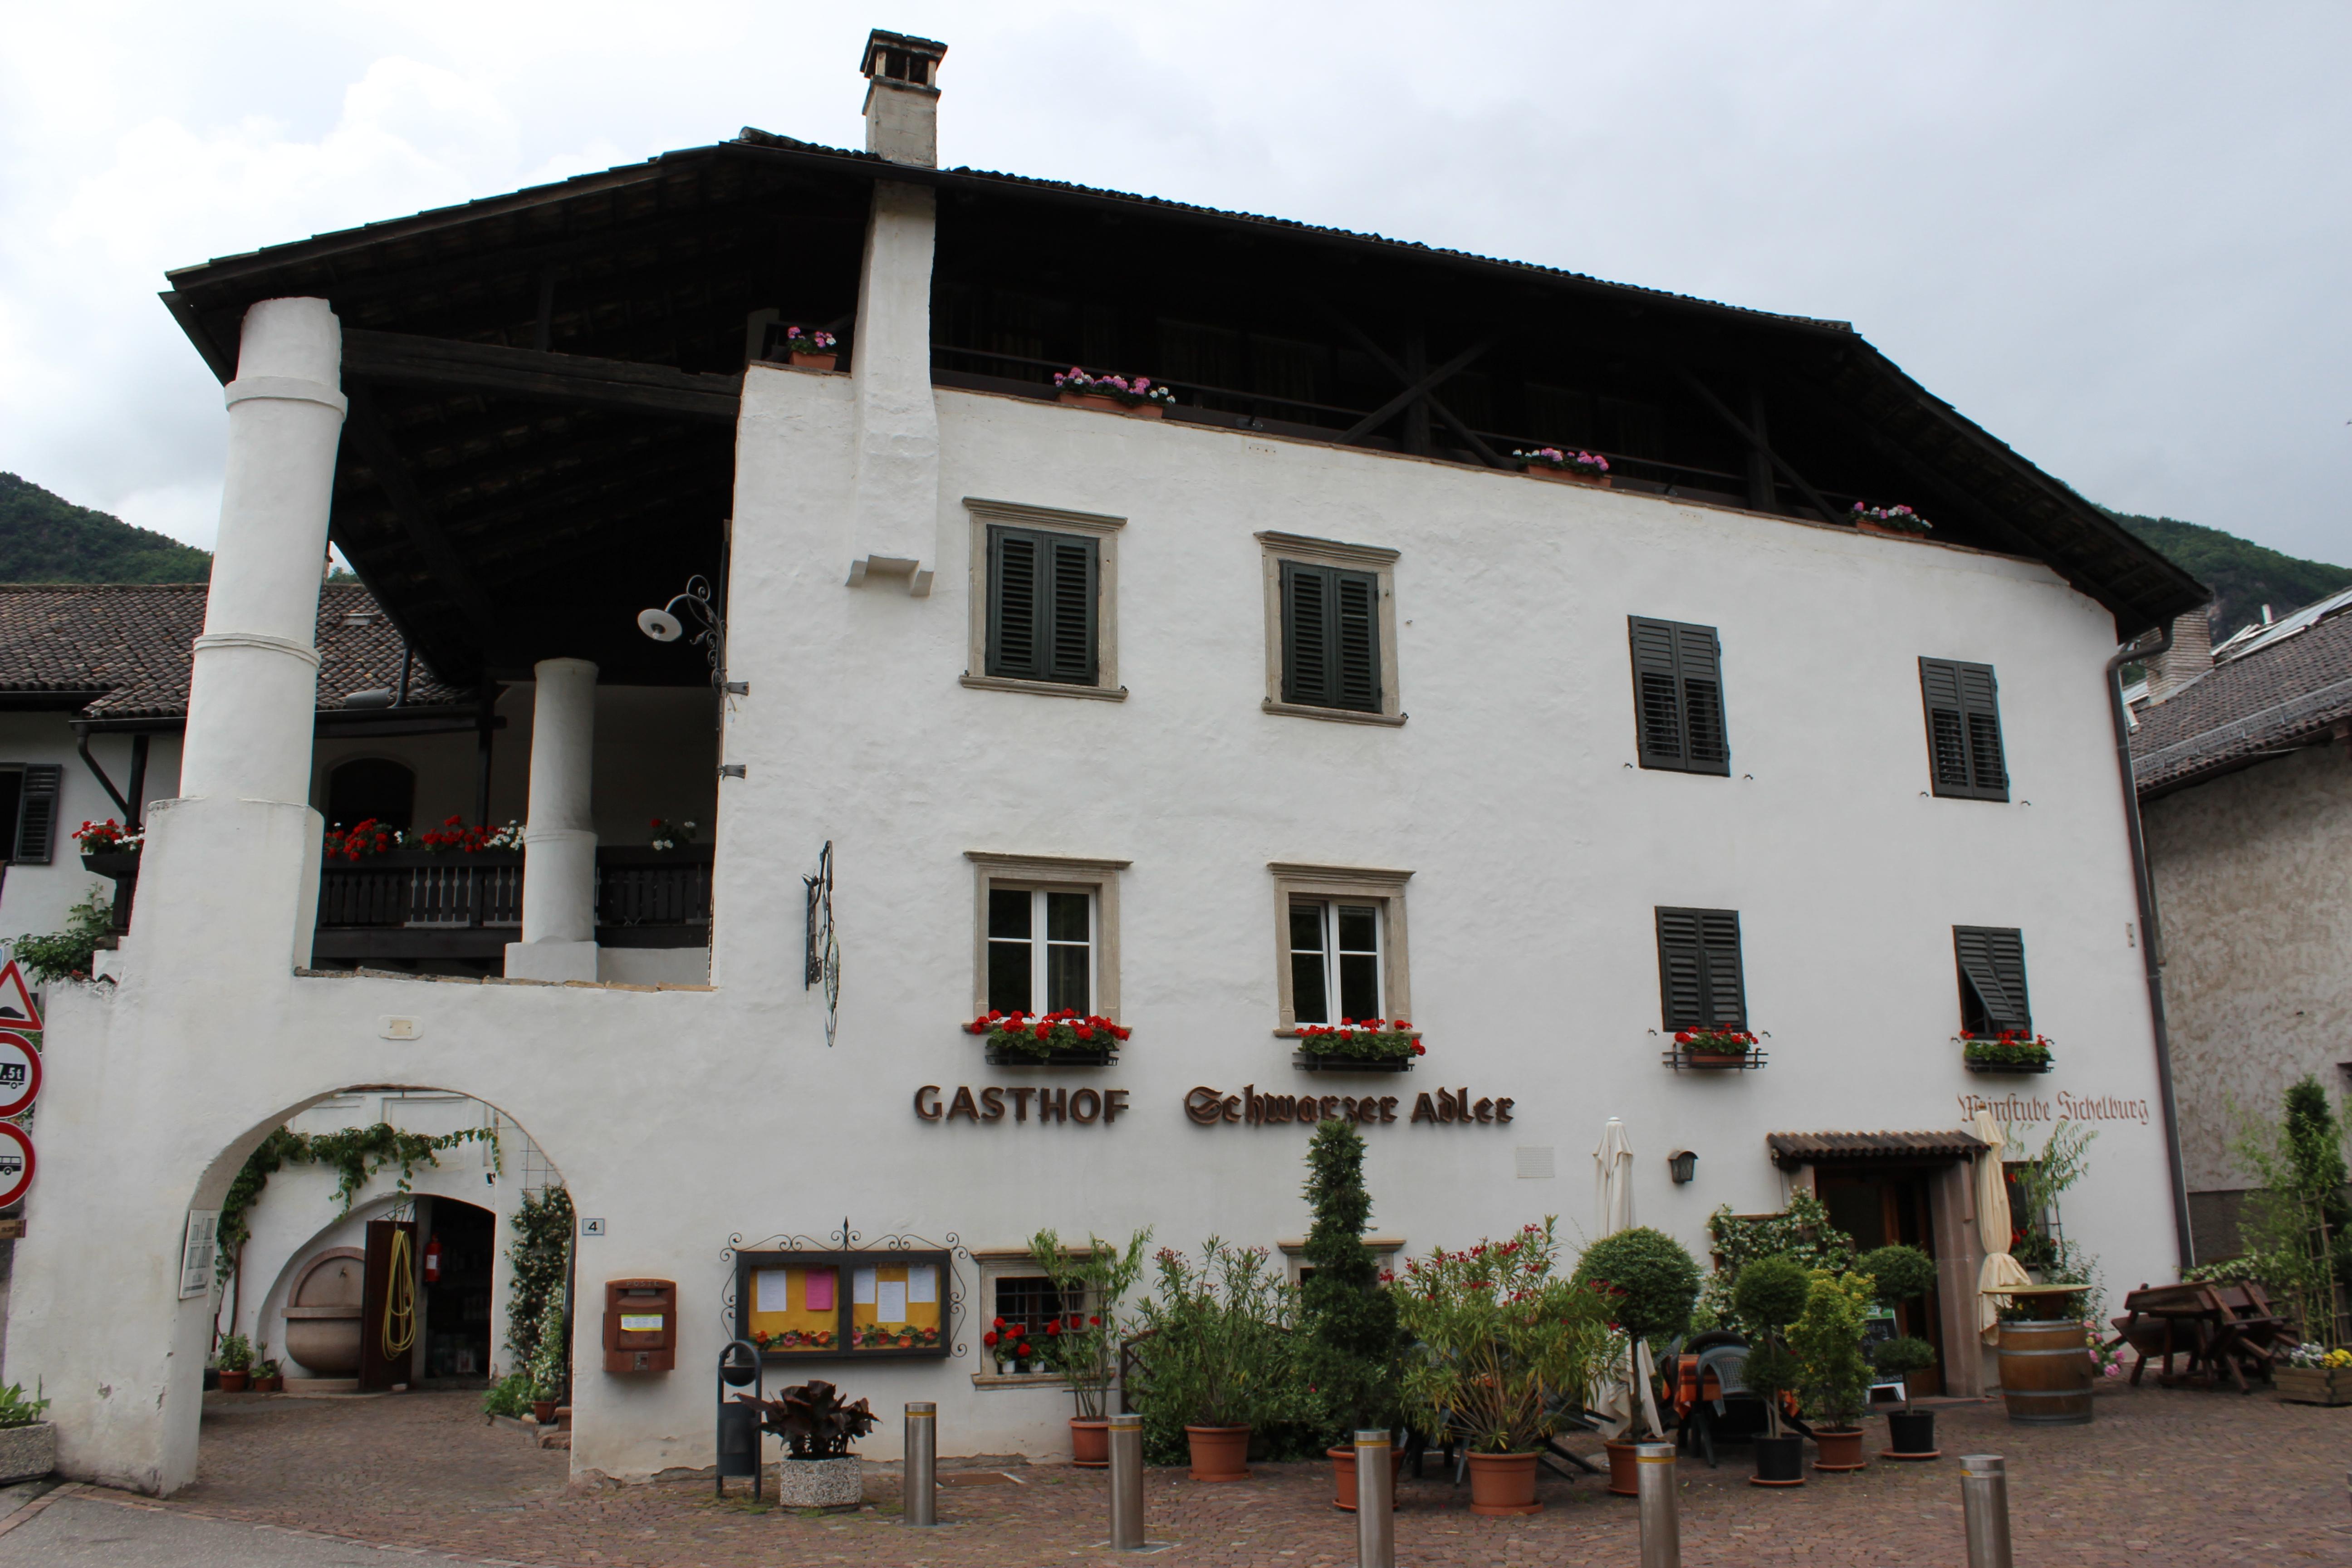 Hotel Gasthof Zur Post Munster Albersloh